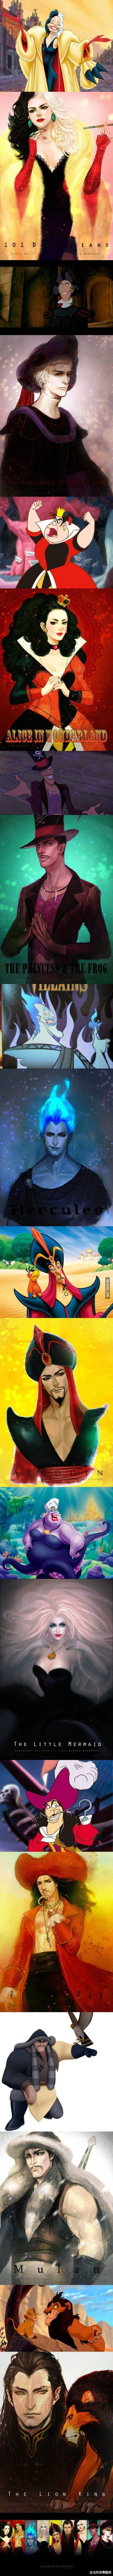 Disney Antagonists reimagined!